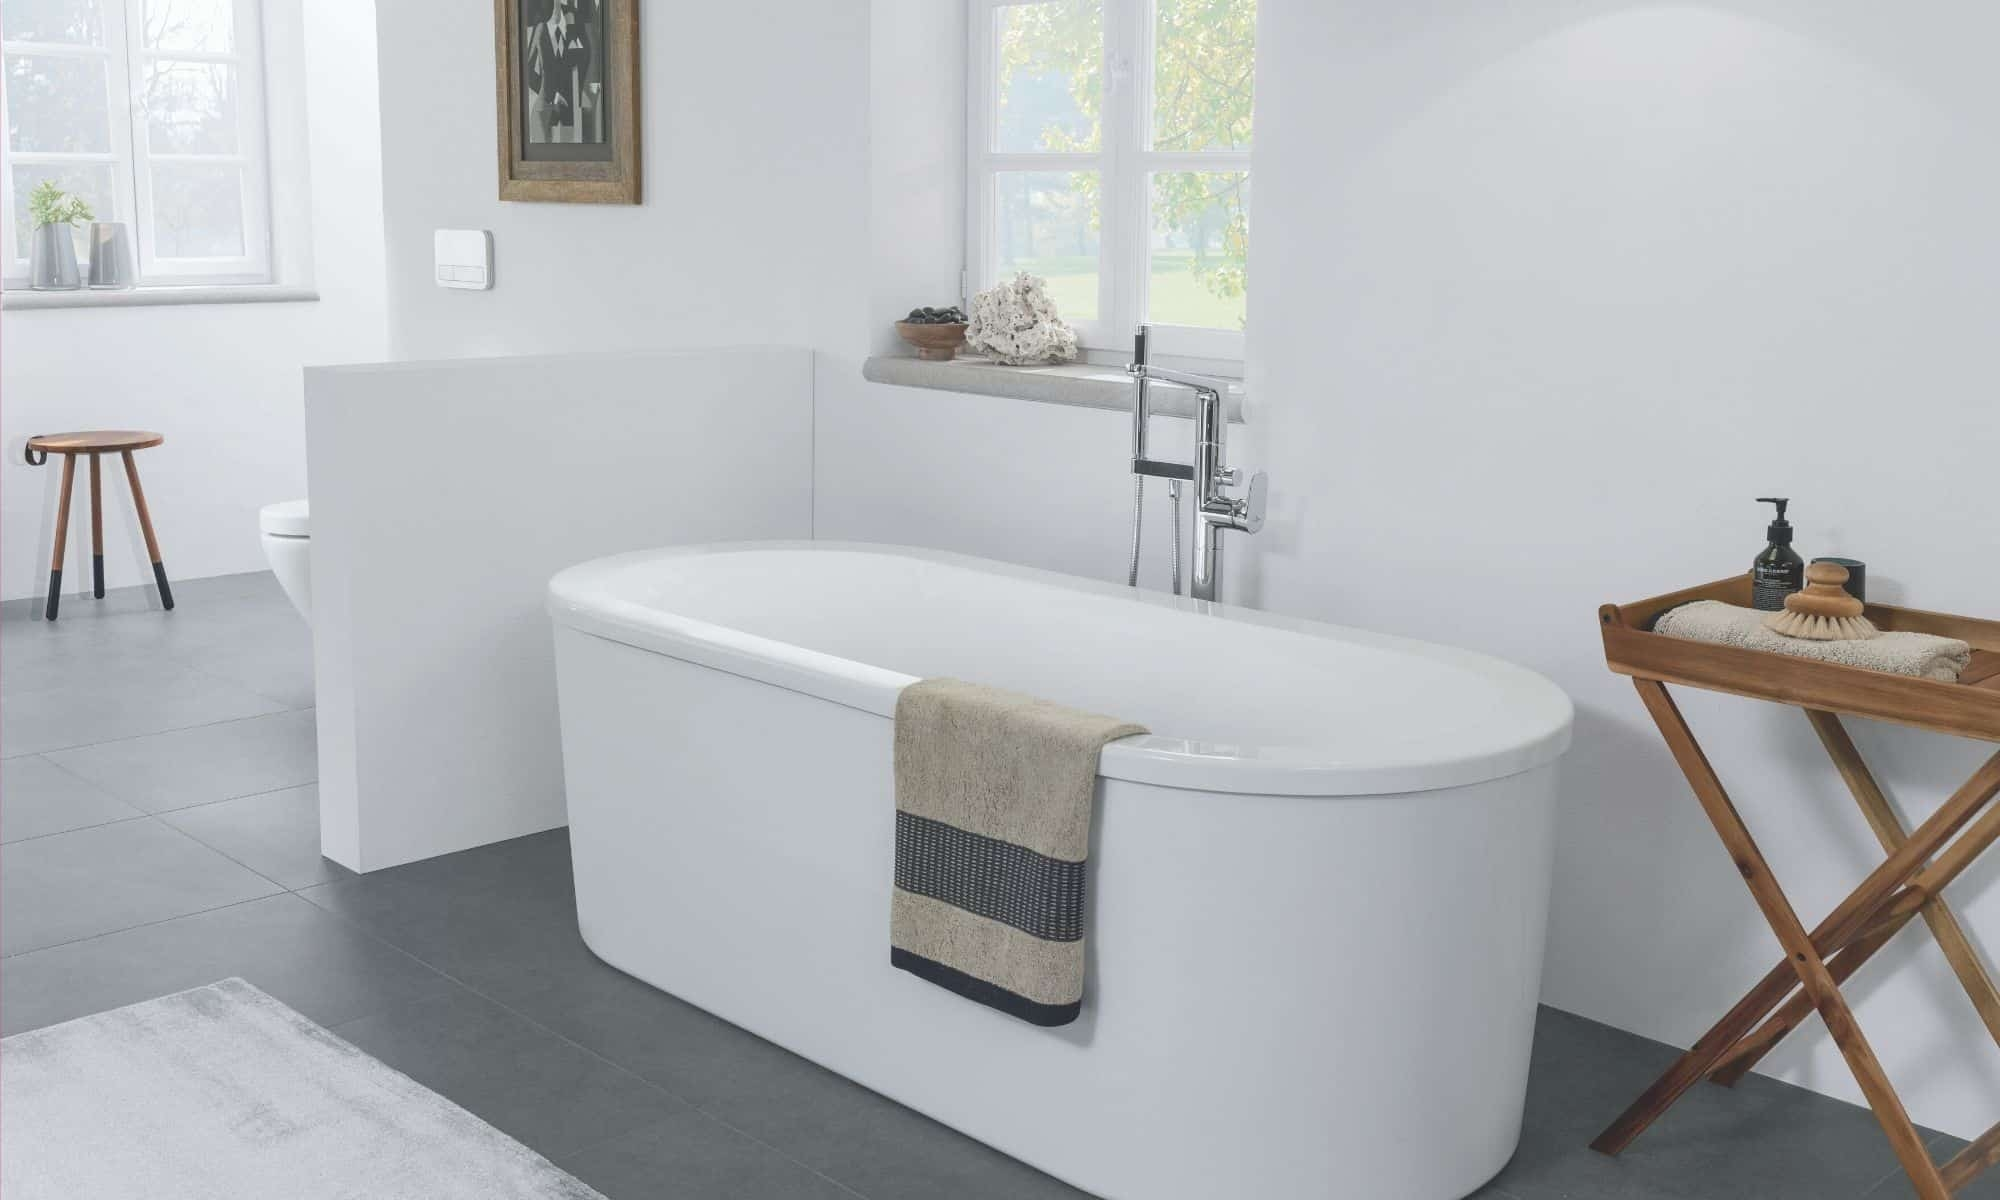 Bathroom in white